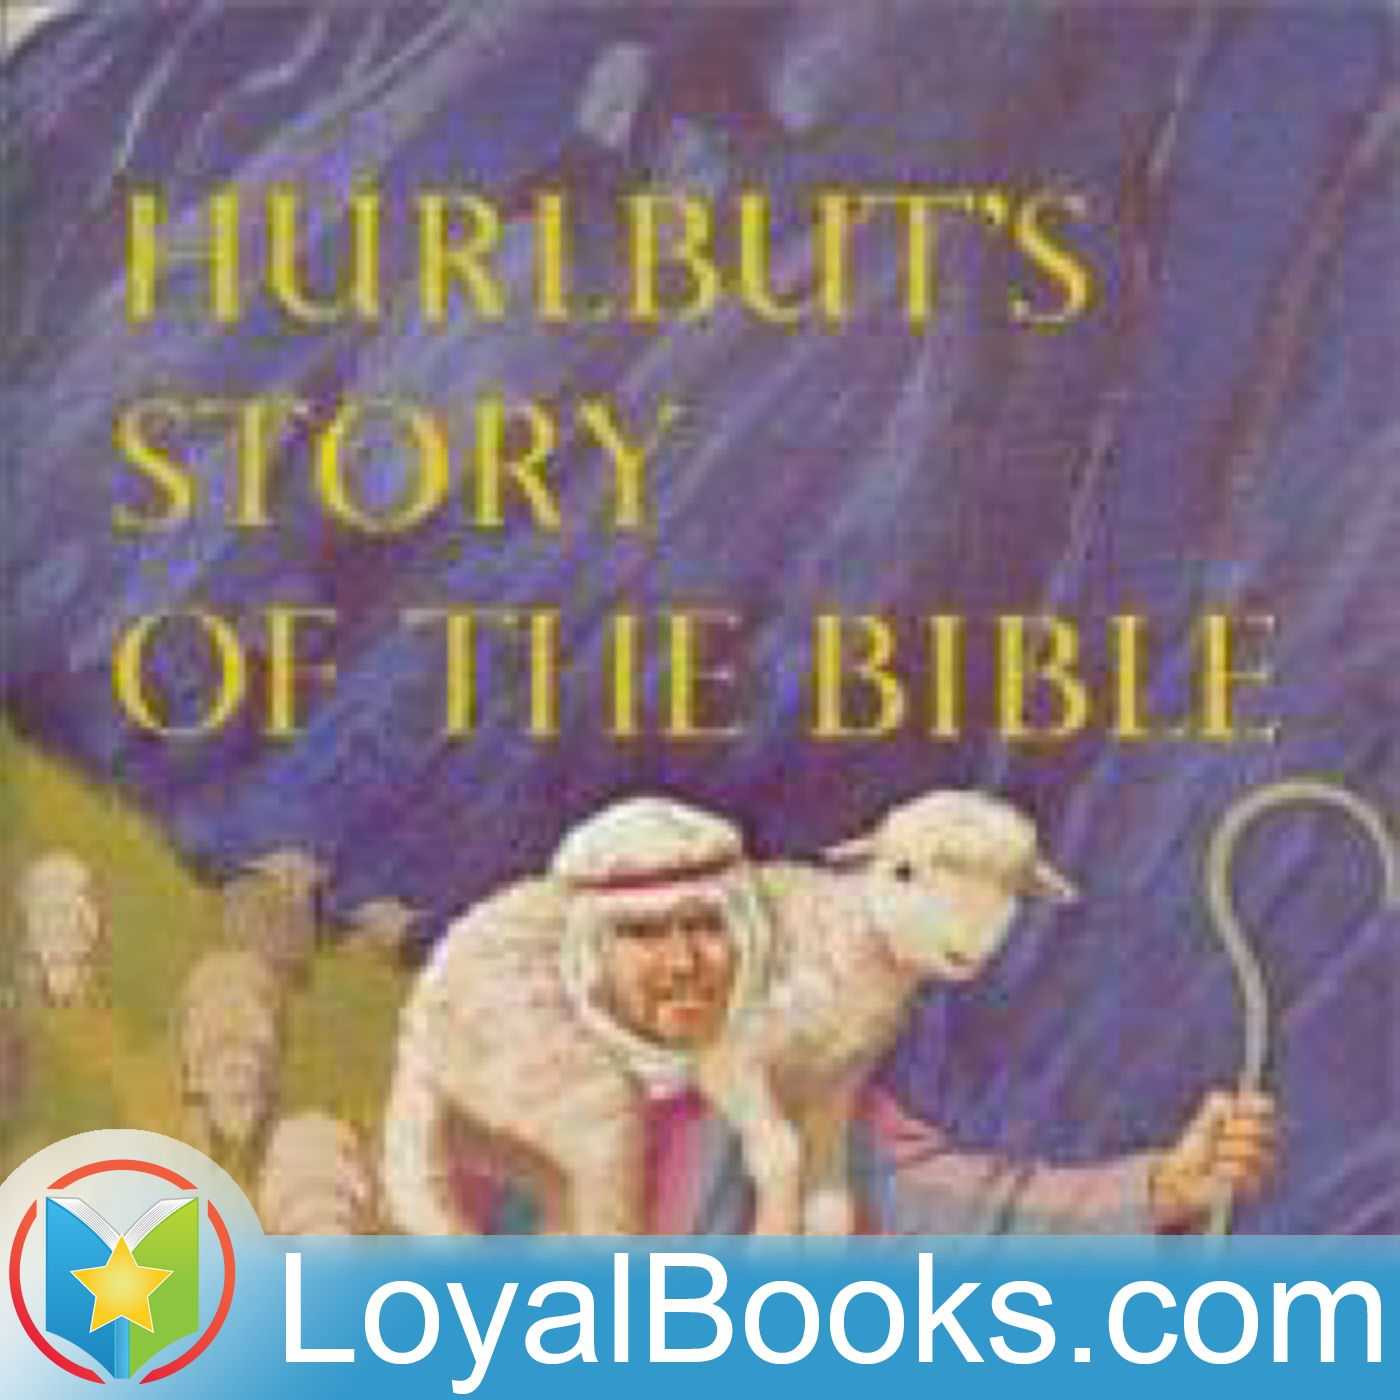 <![CDATA[Hurlbut's Story of the Bible by Jesse Lyman Hurlbut]]>